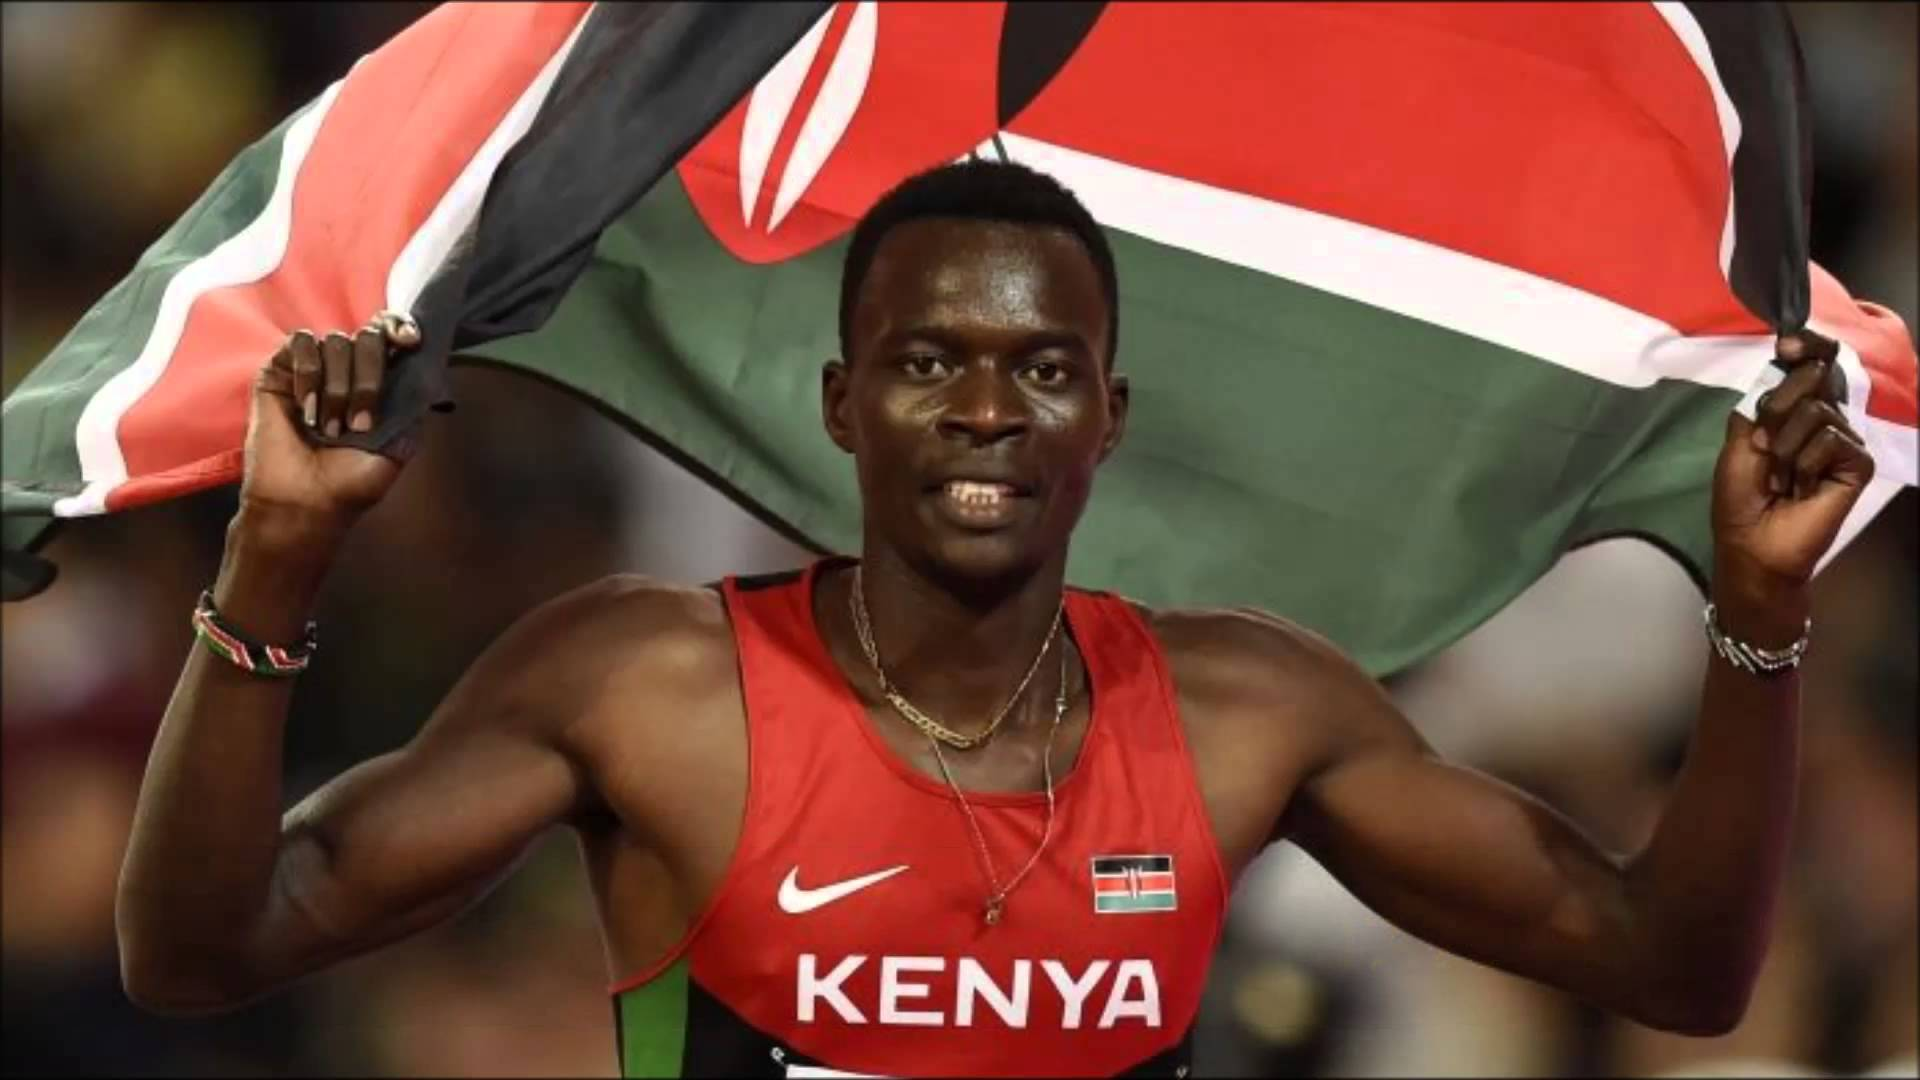 Another Kenya Runner Gets Popped Taking EPO